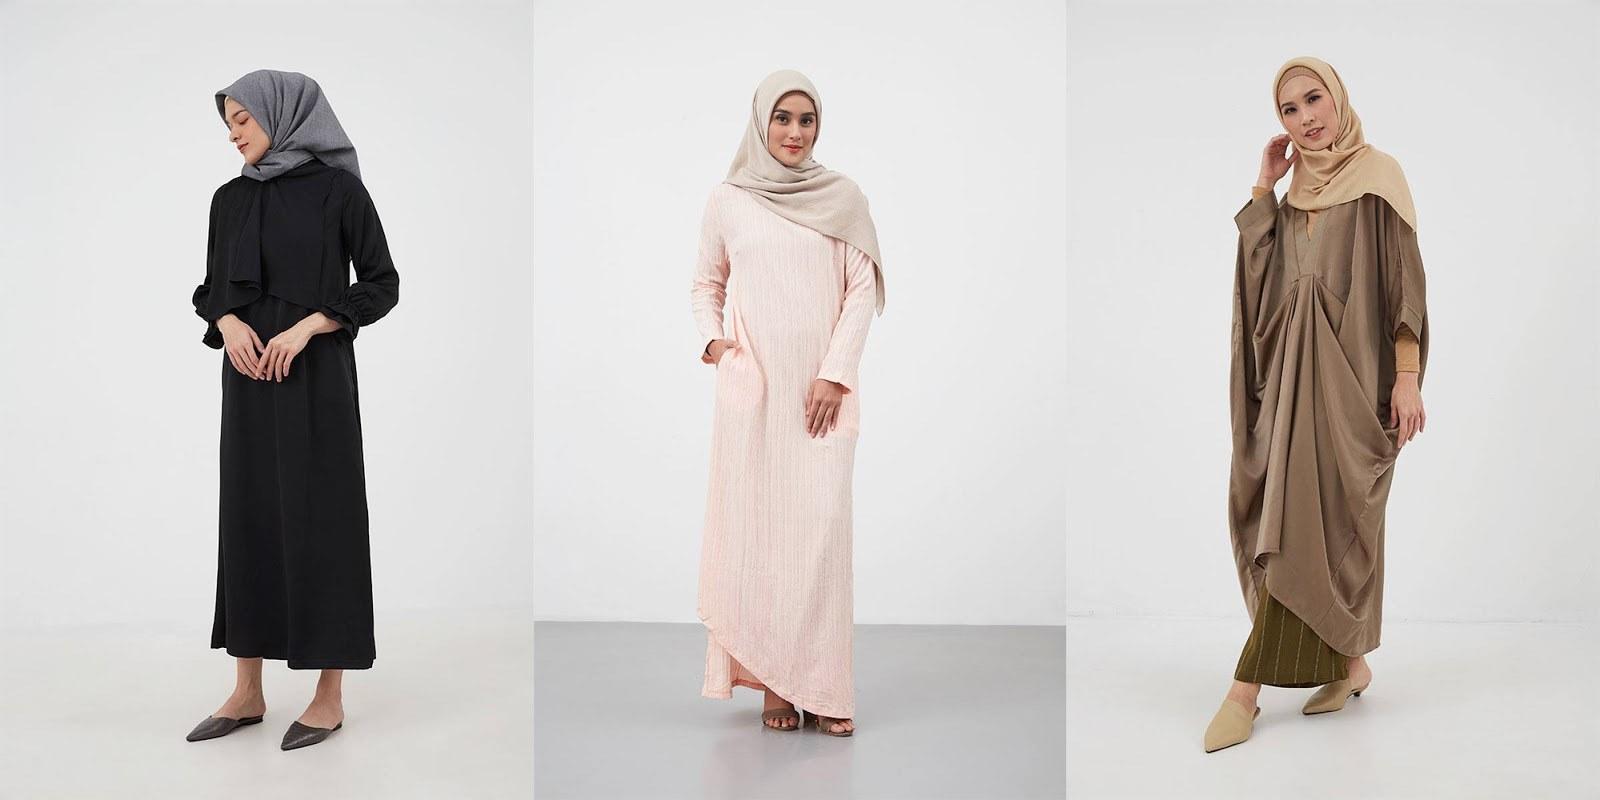 Ide Trend Warna Baju Lebaran 2020 Wddj Intip Trend Model Baju Gamis Lebaran 2020 Dari Hijabenka